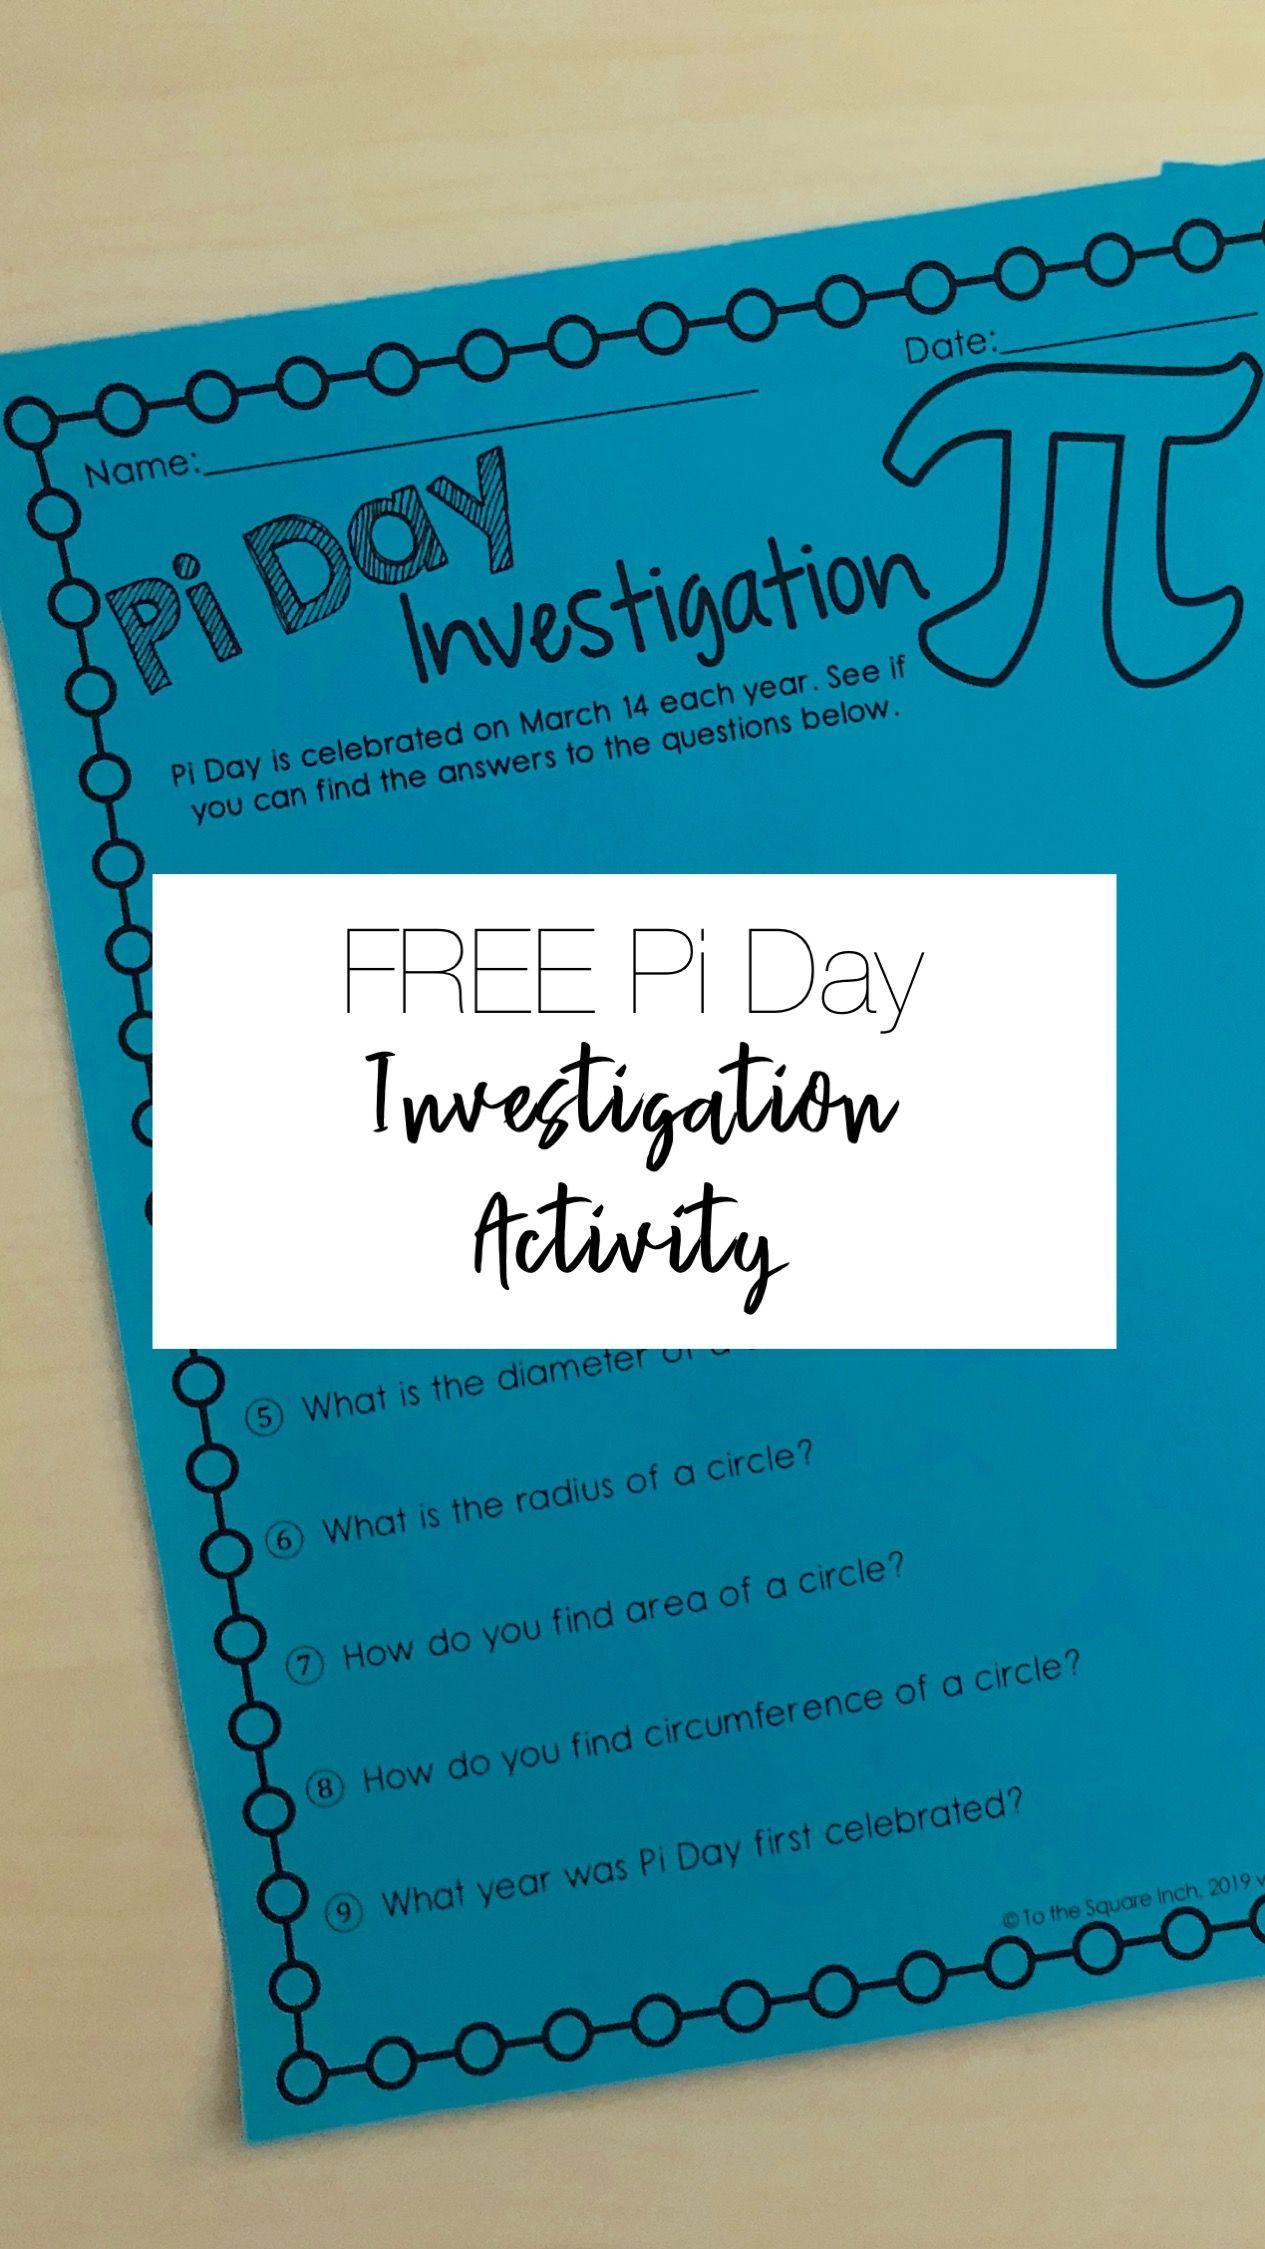 Free Pi Day Scavenger Hunt